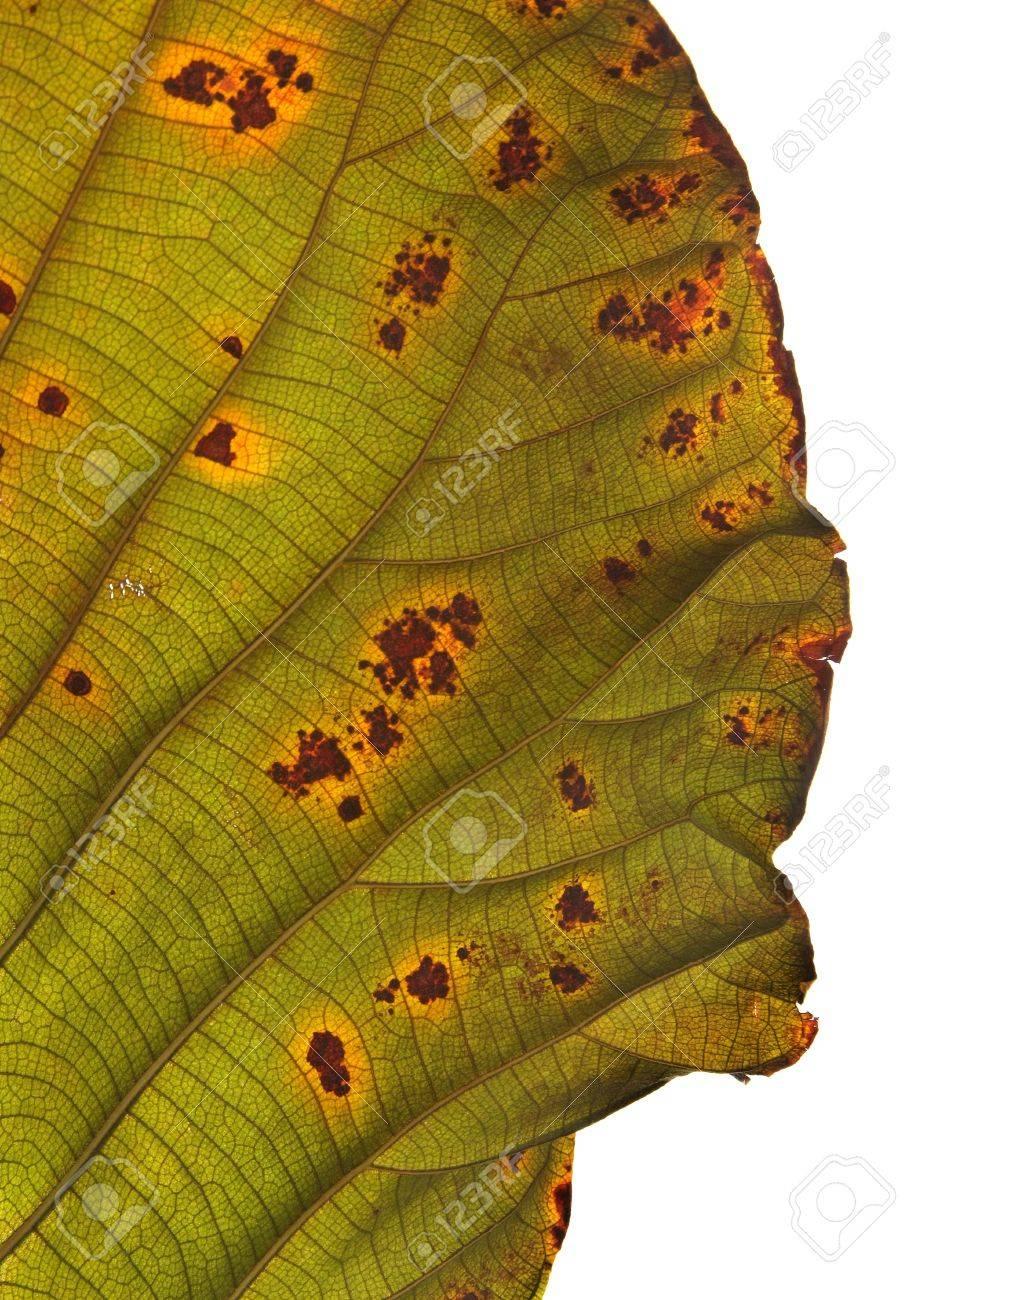 Decomposition of Teak Leaf, close up, isolated on white background Stock Photo - 15440524